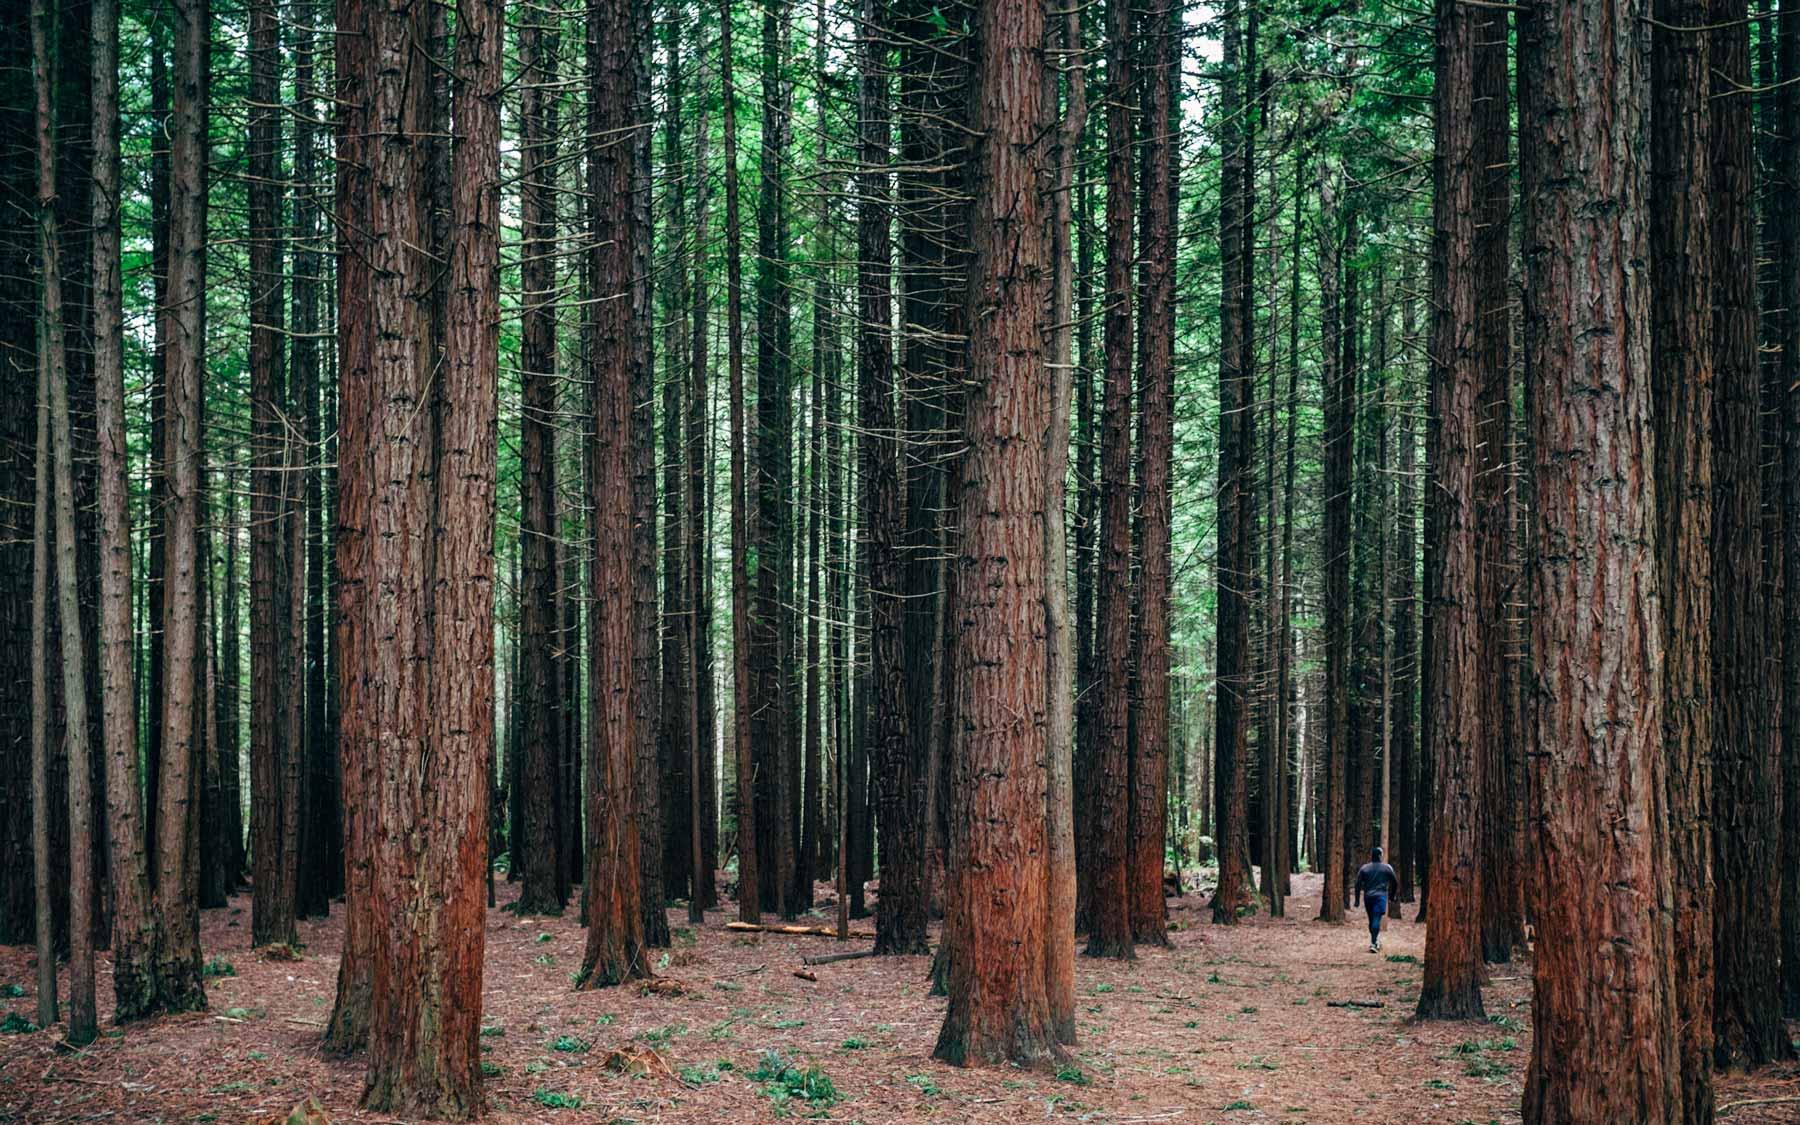 A walker enters The Redwood Memorial Grove in Whakarewarewa Forest.